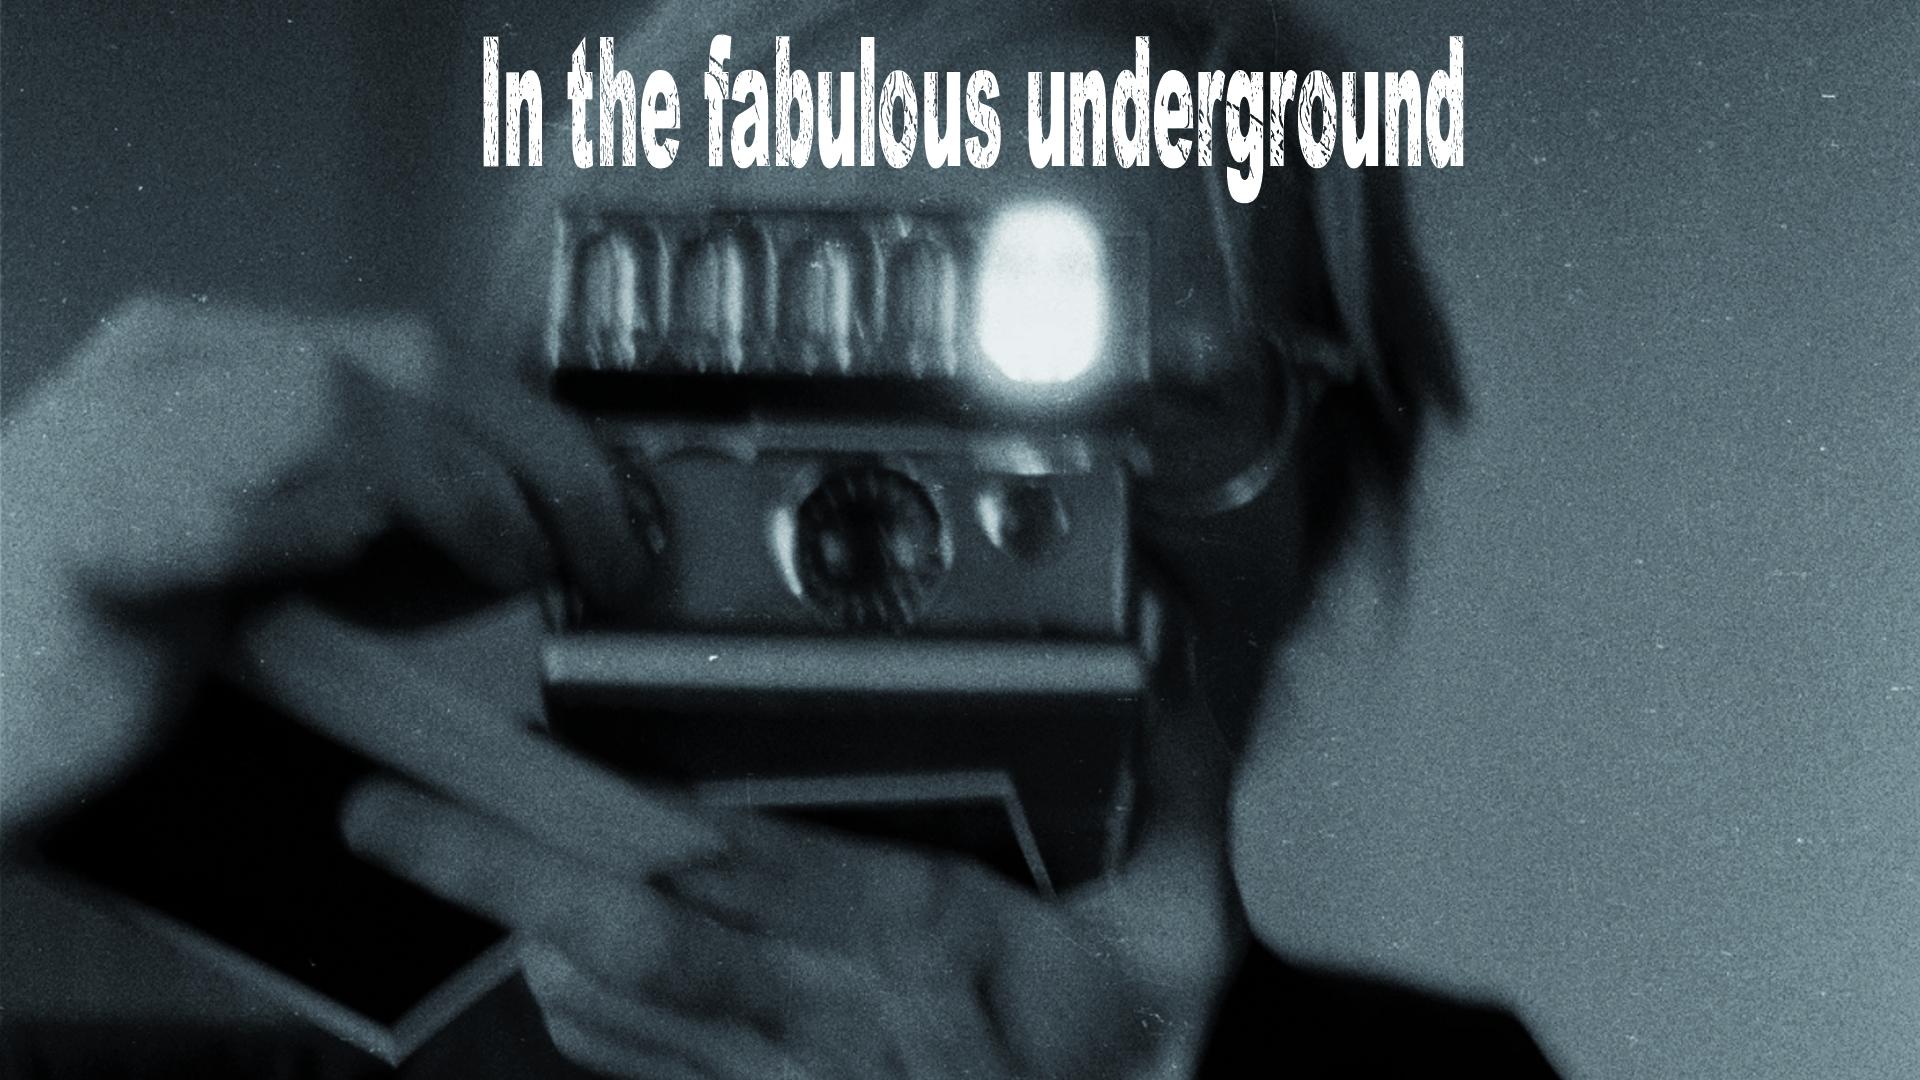 In The Fabulous Underground